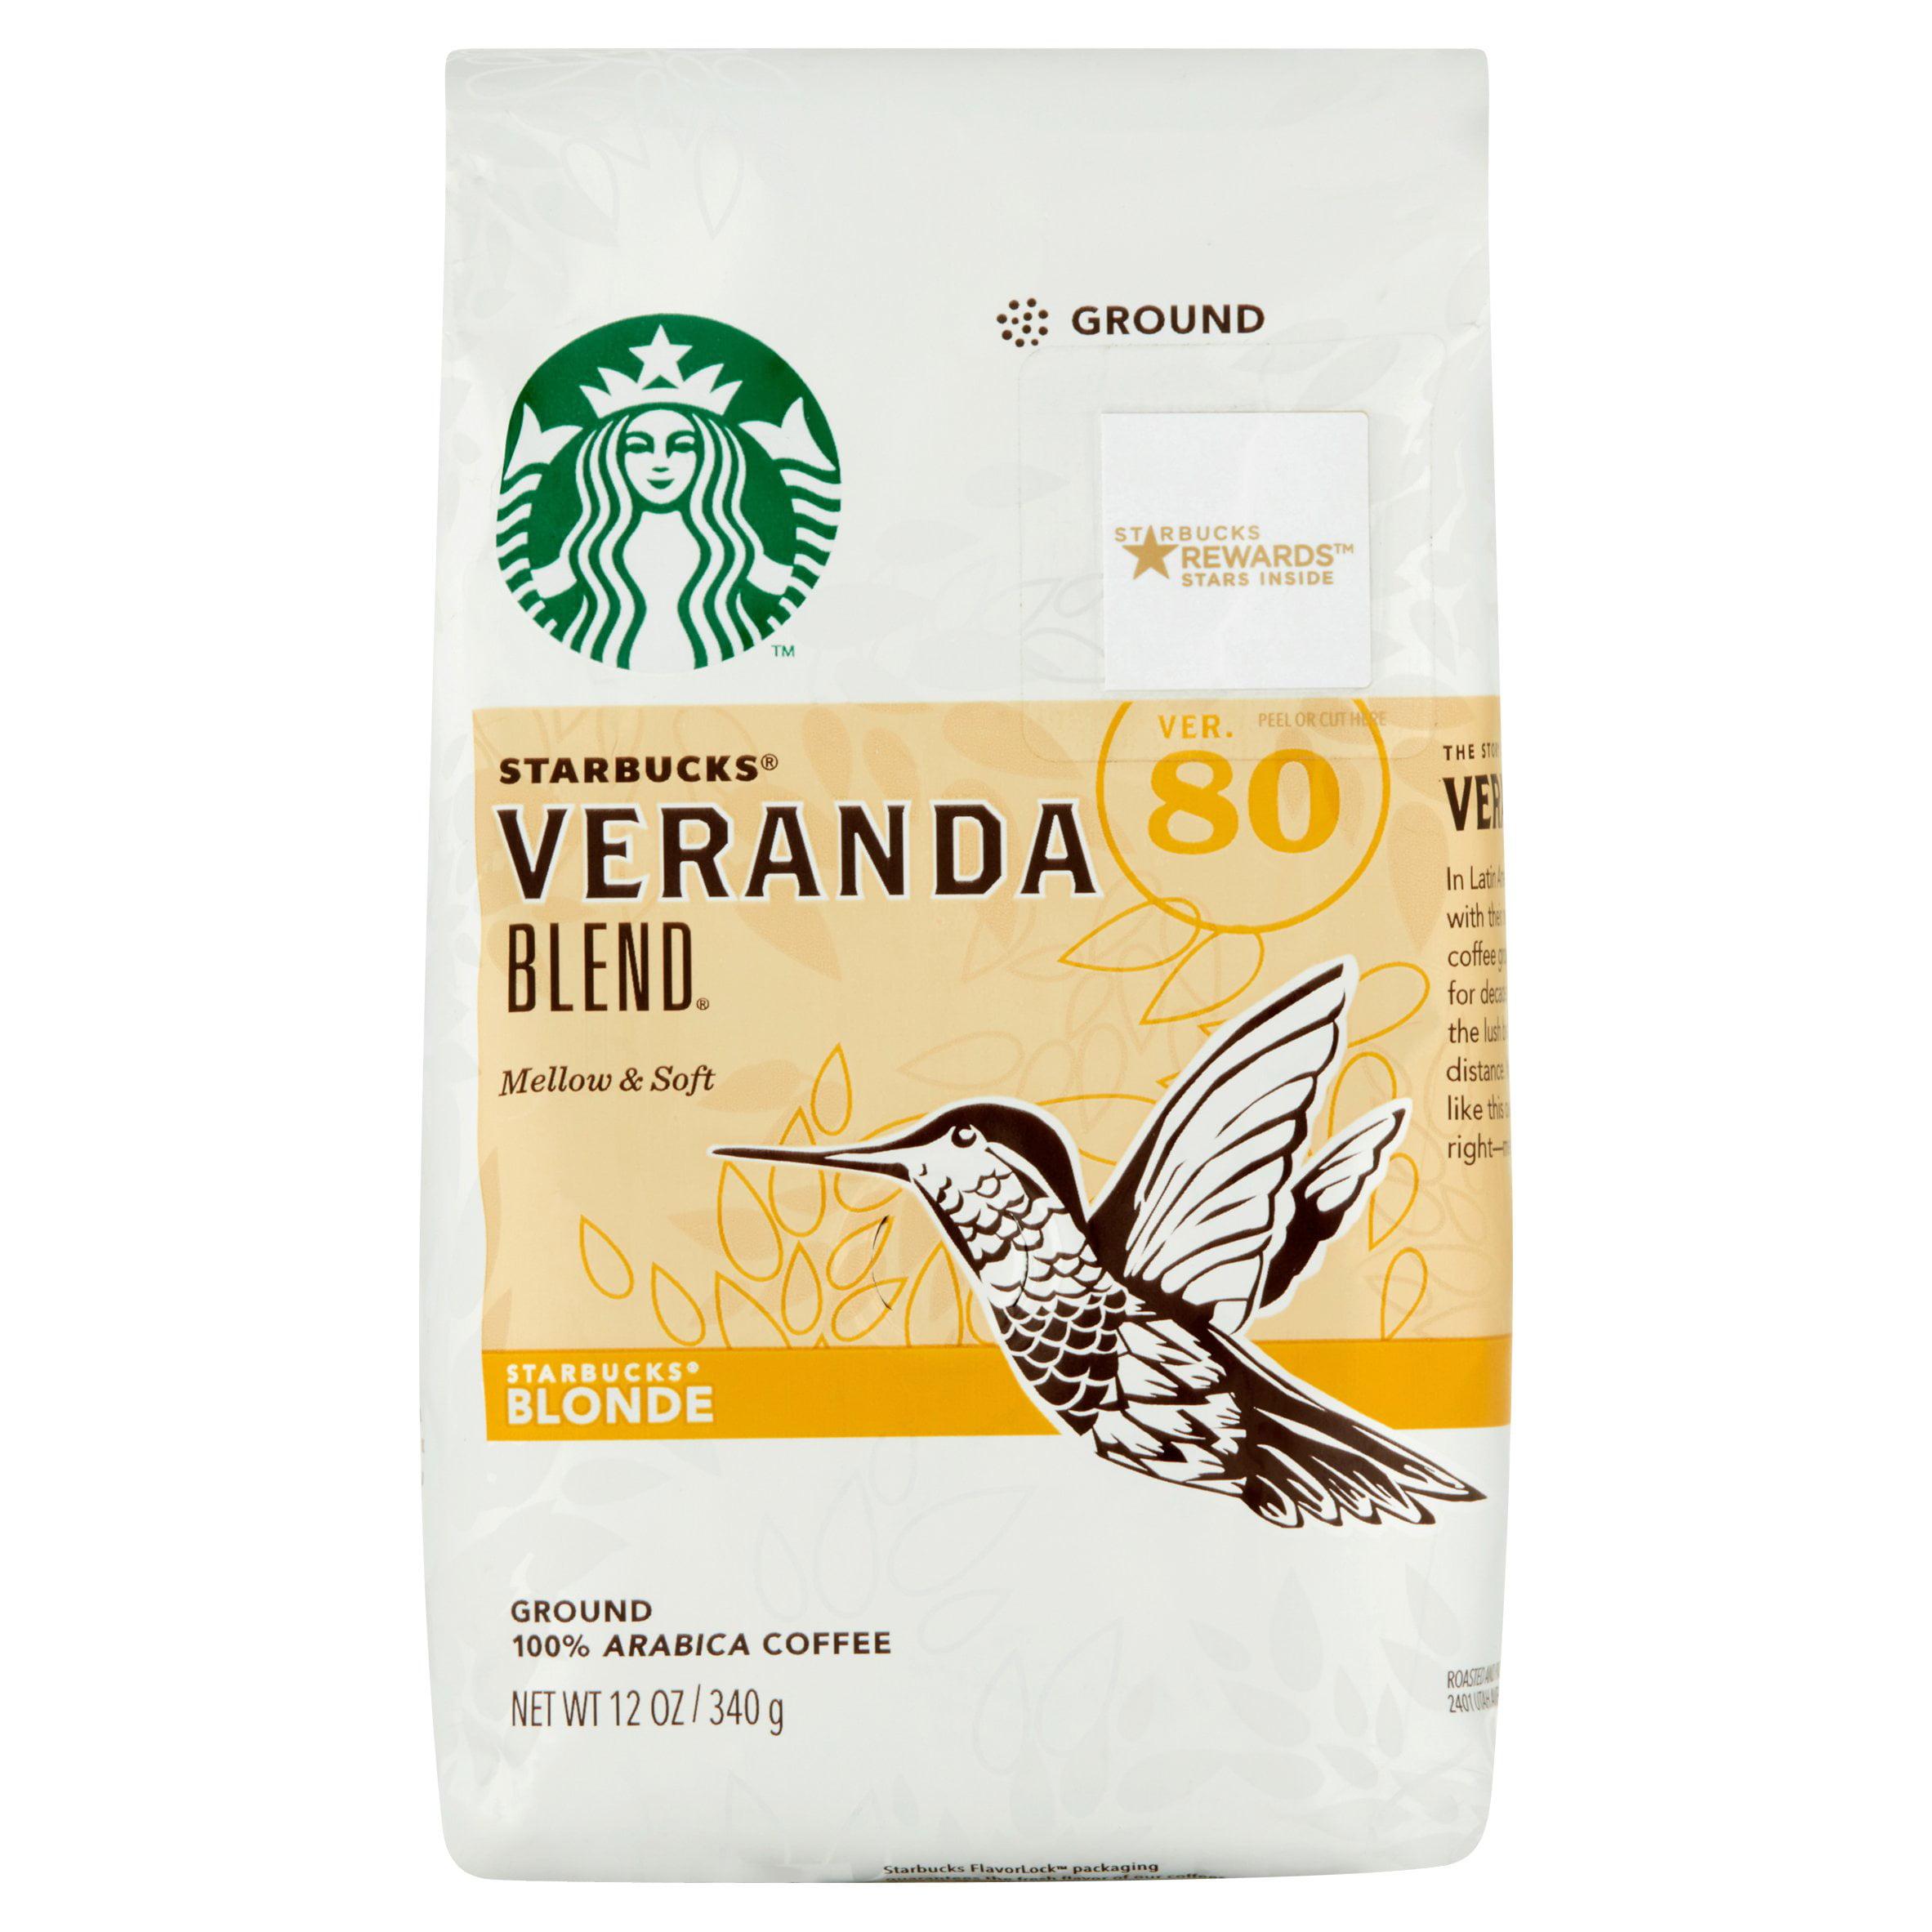 Starbucks Blonde Veranda Blend Ground Coffee 12 oz. Bag by STARBUCKS COFFEE COMPANY